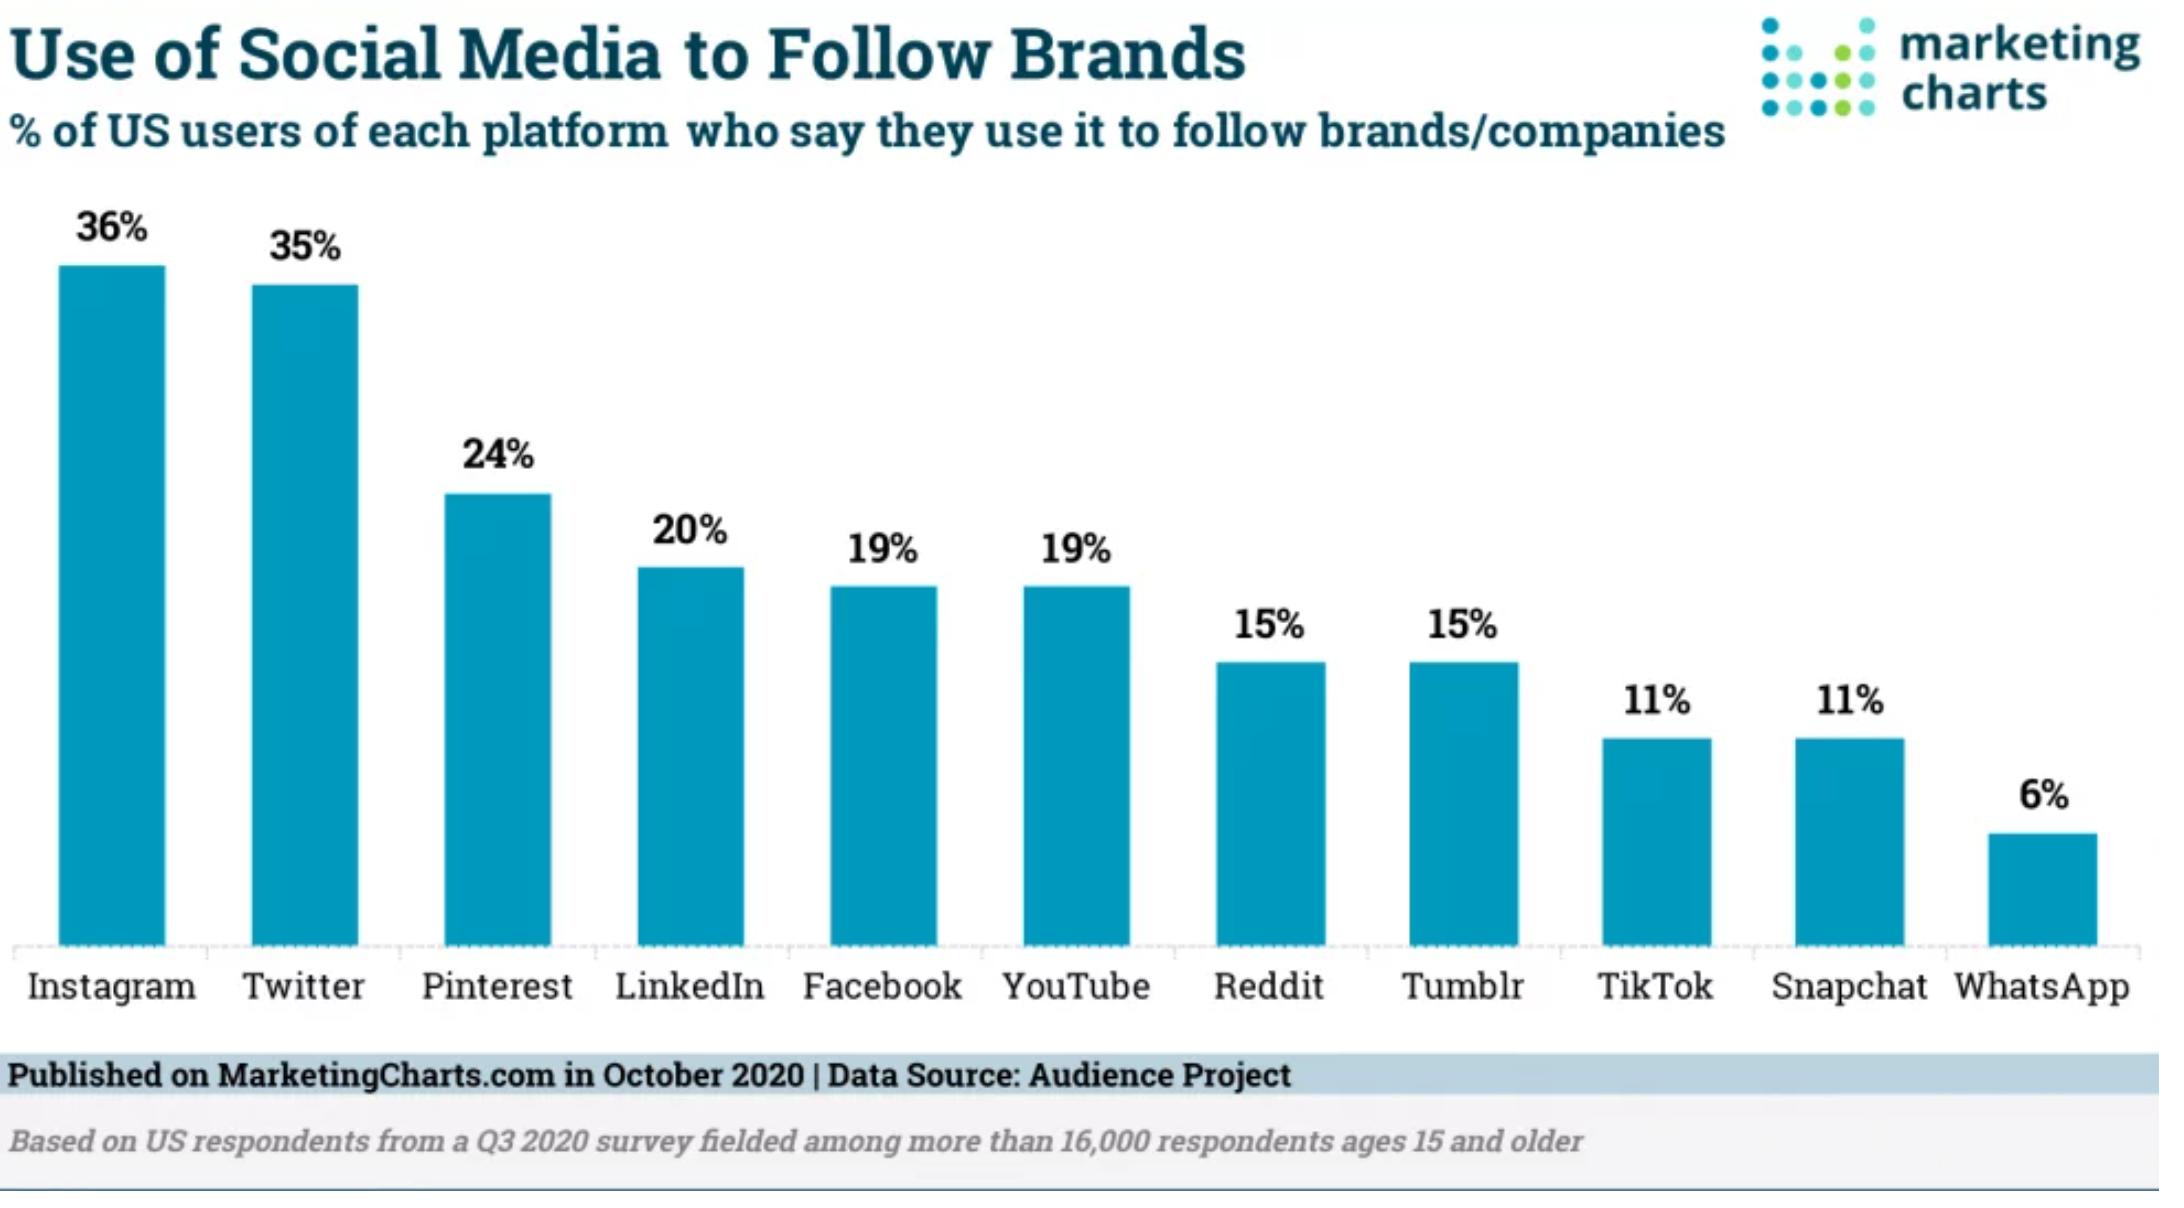 Favorite Platform to Follow Brands